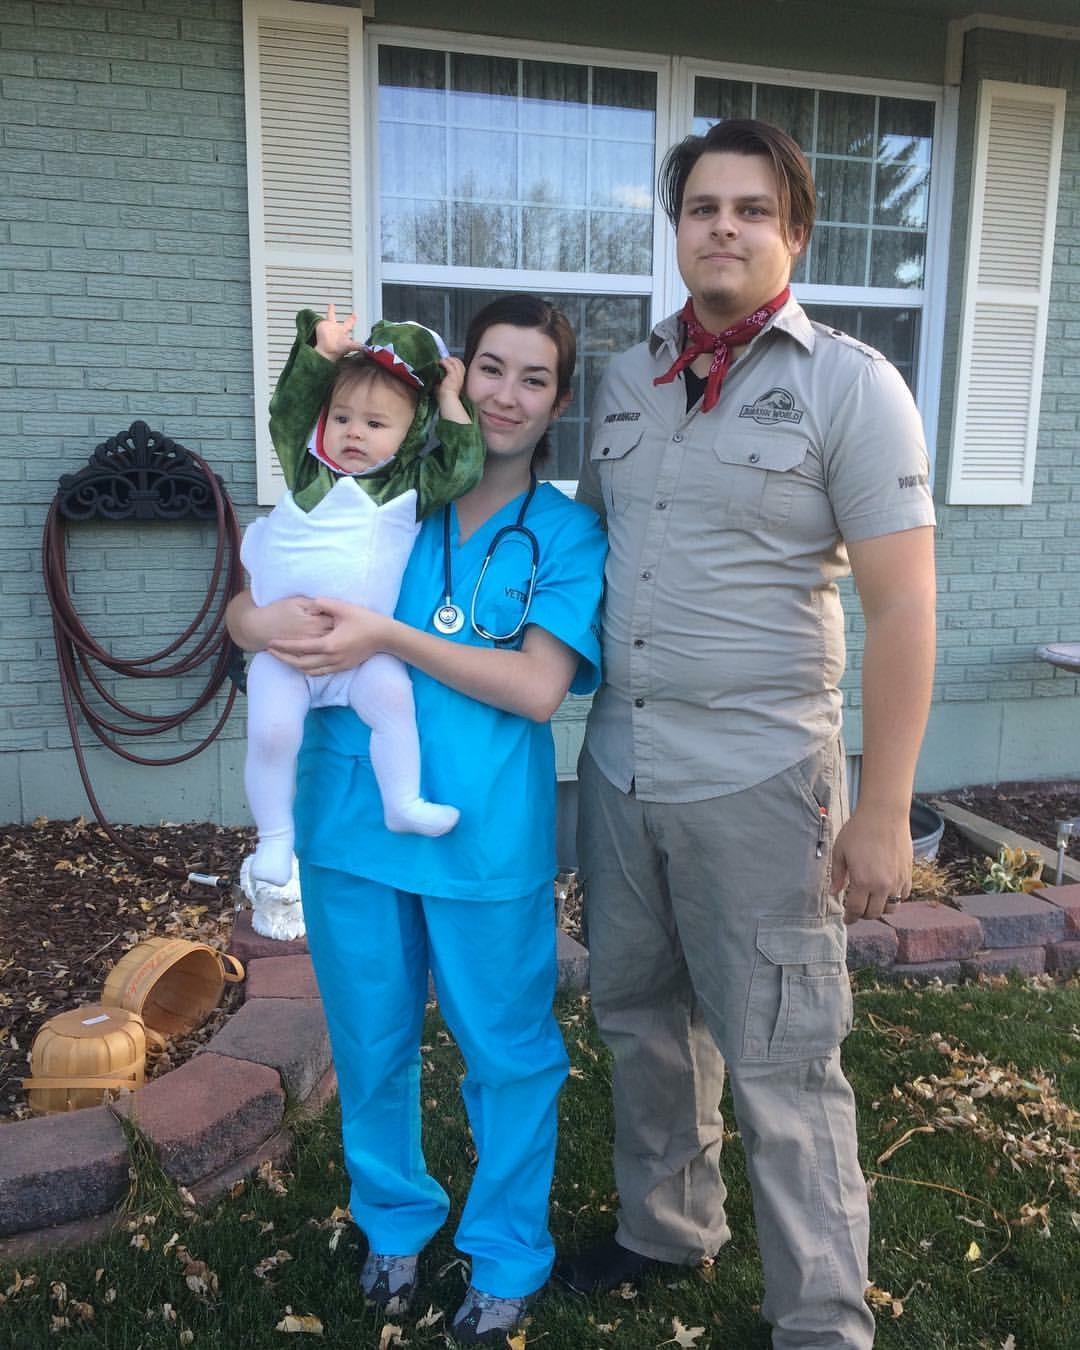 2016. My all time favorite family costume. Dinosaur hatch-ling, veterinarian, and Jurassic Park ranger.